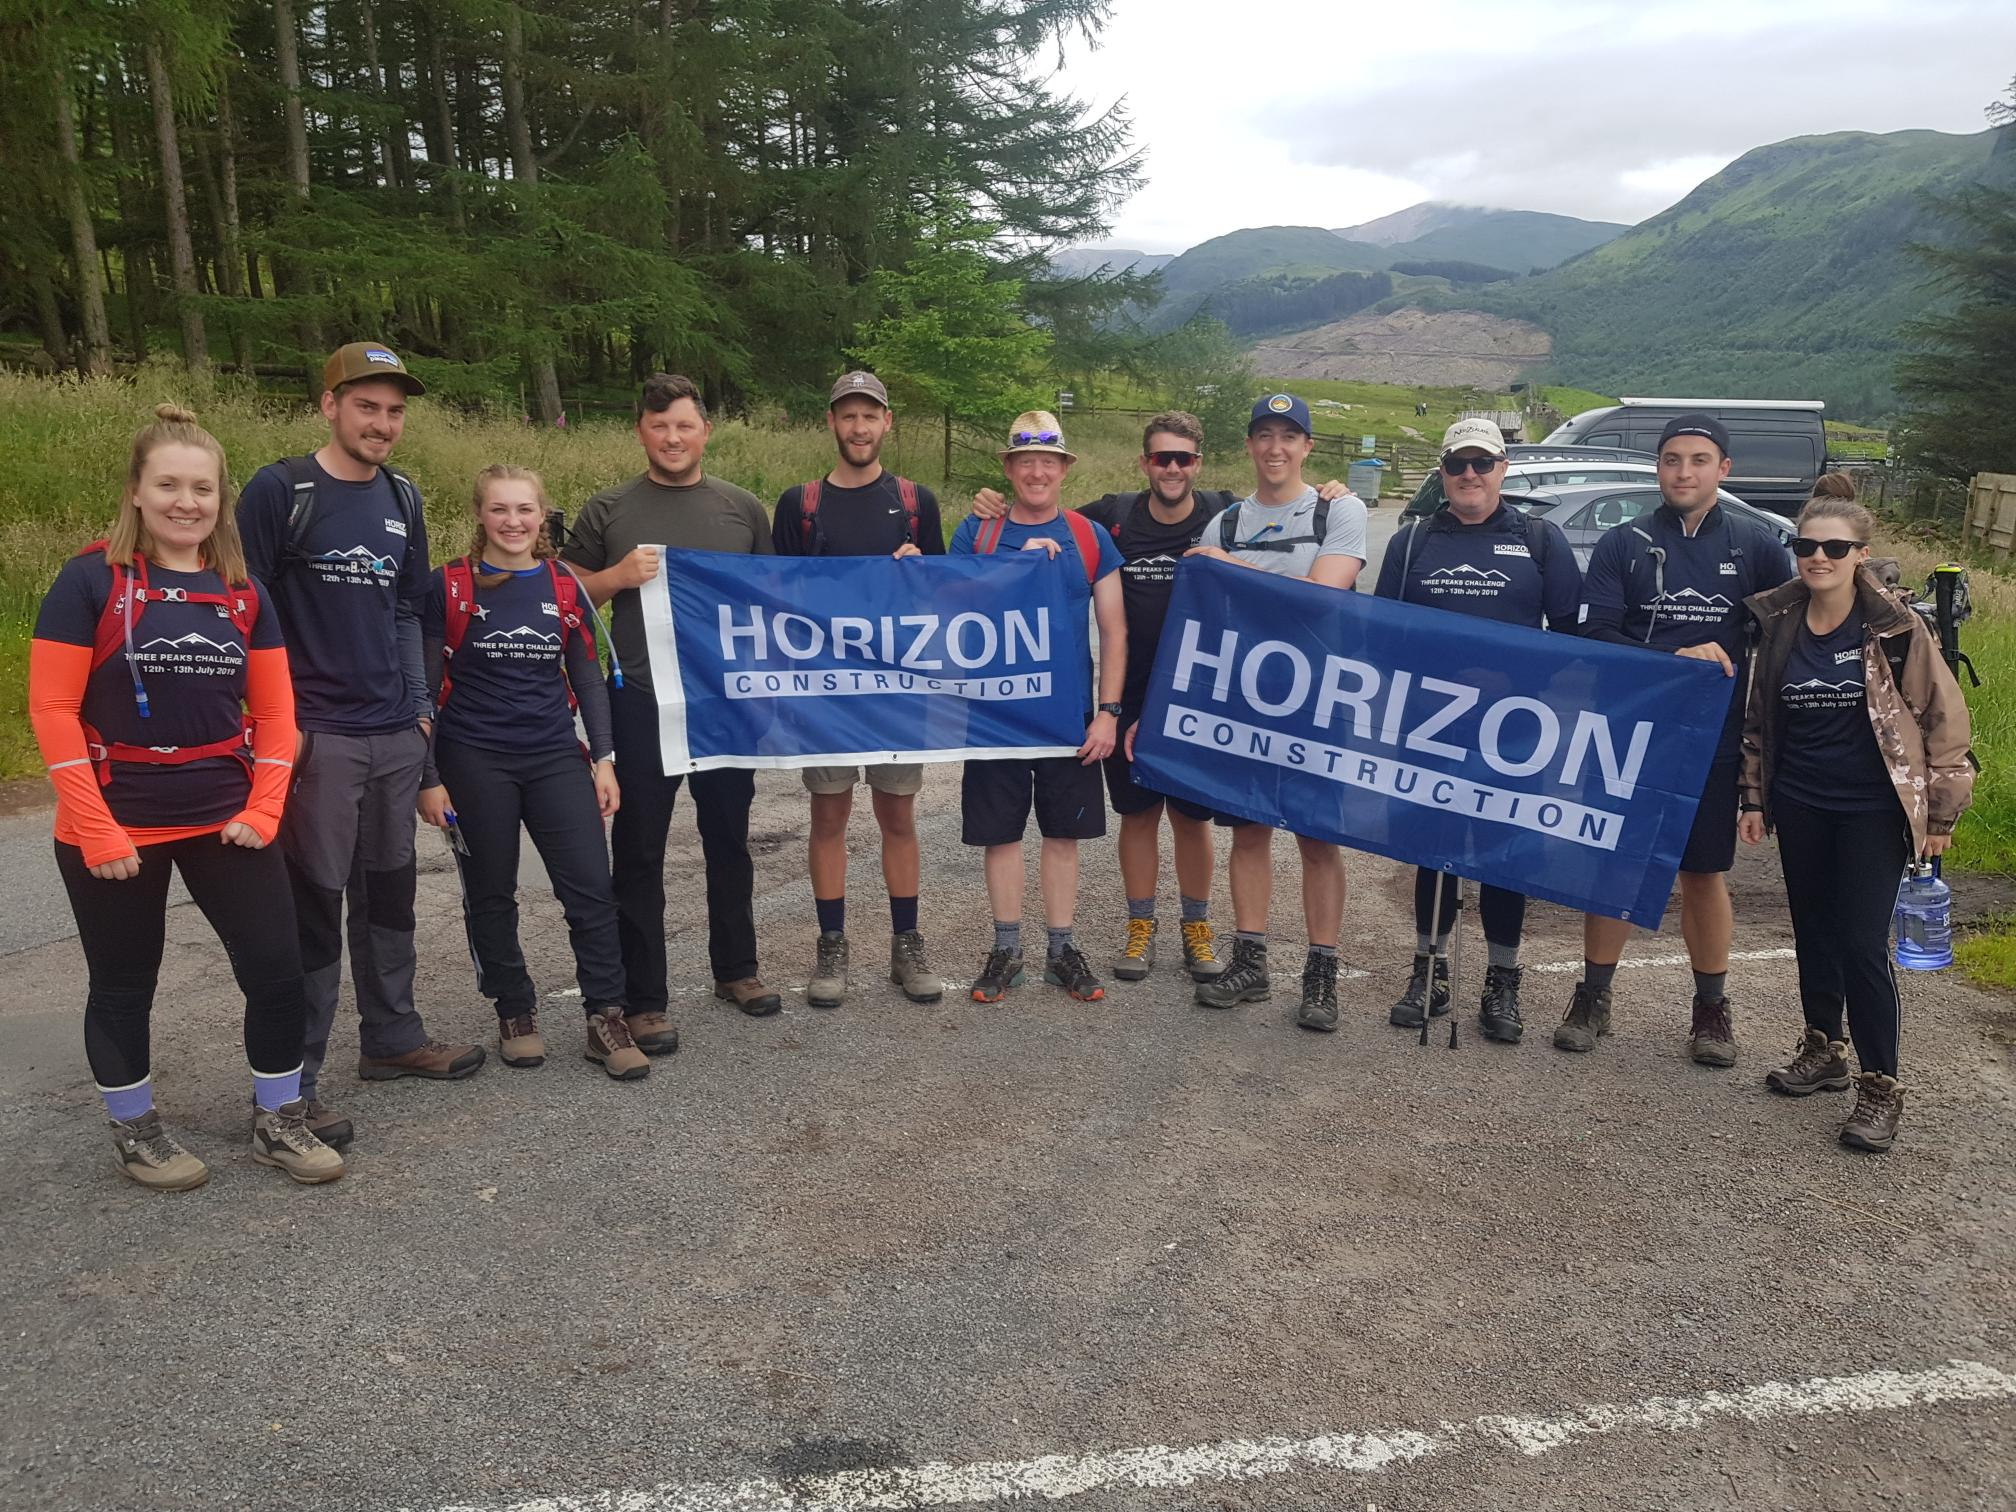 Three Peaks Challenge - Horizon Construction